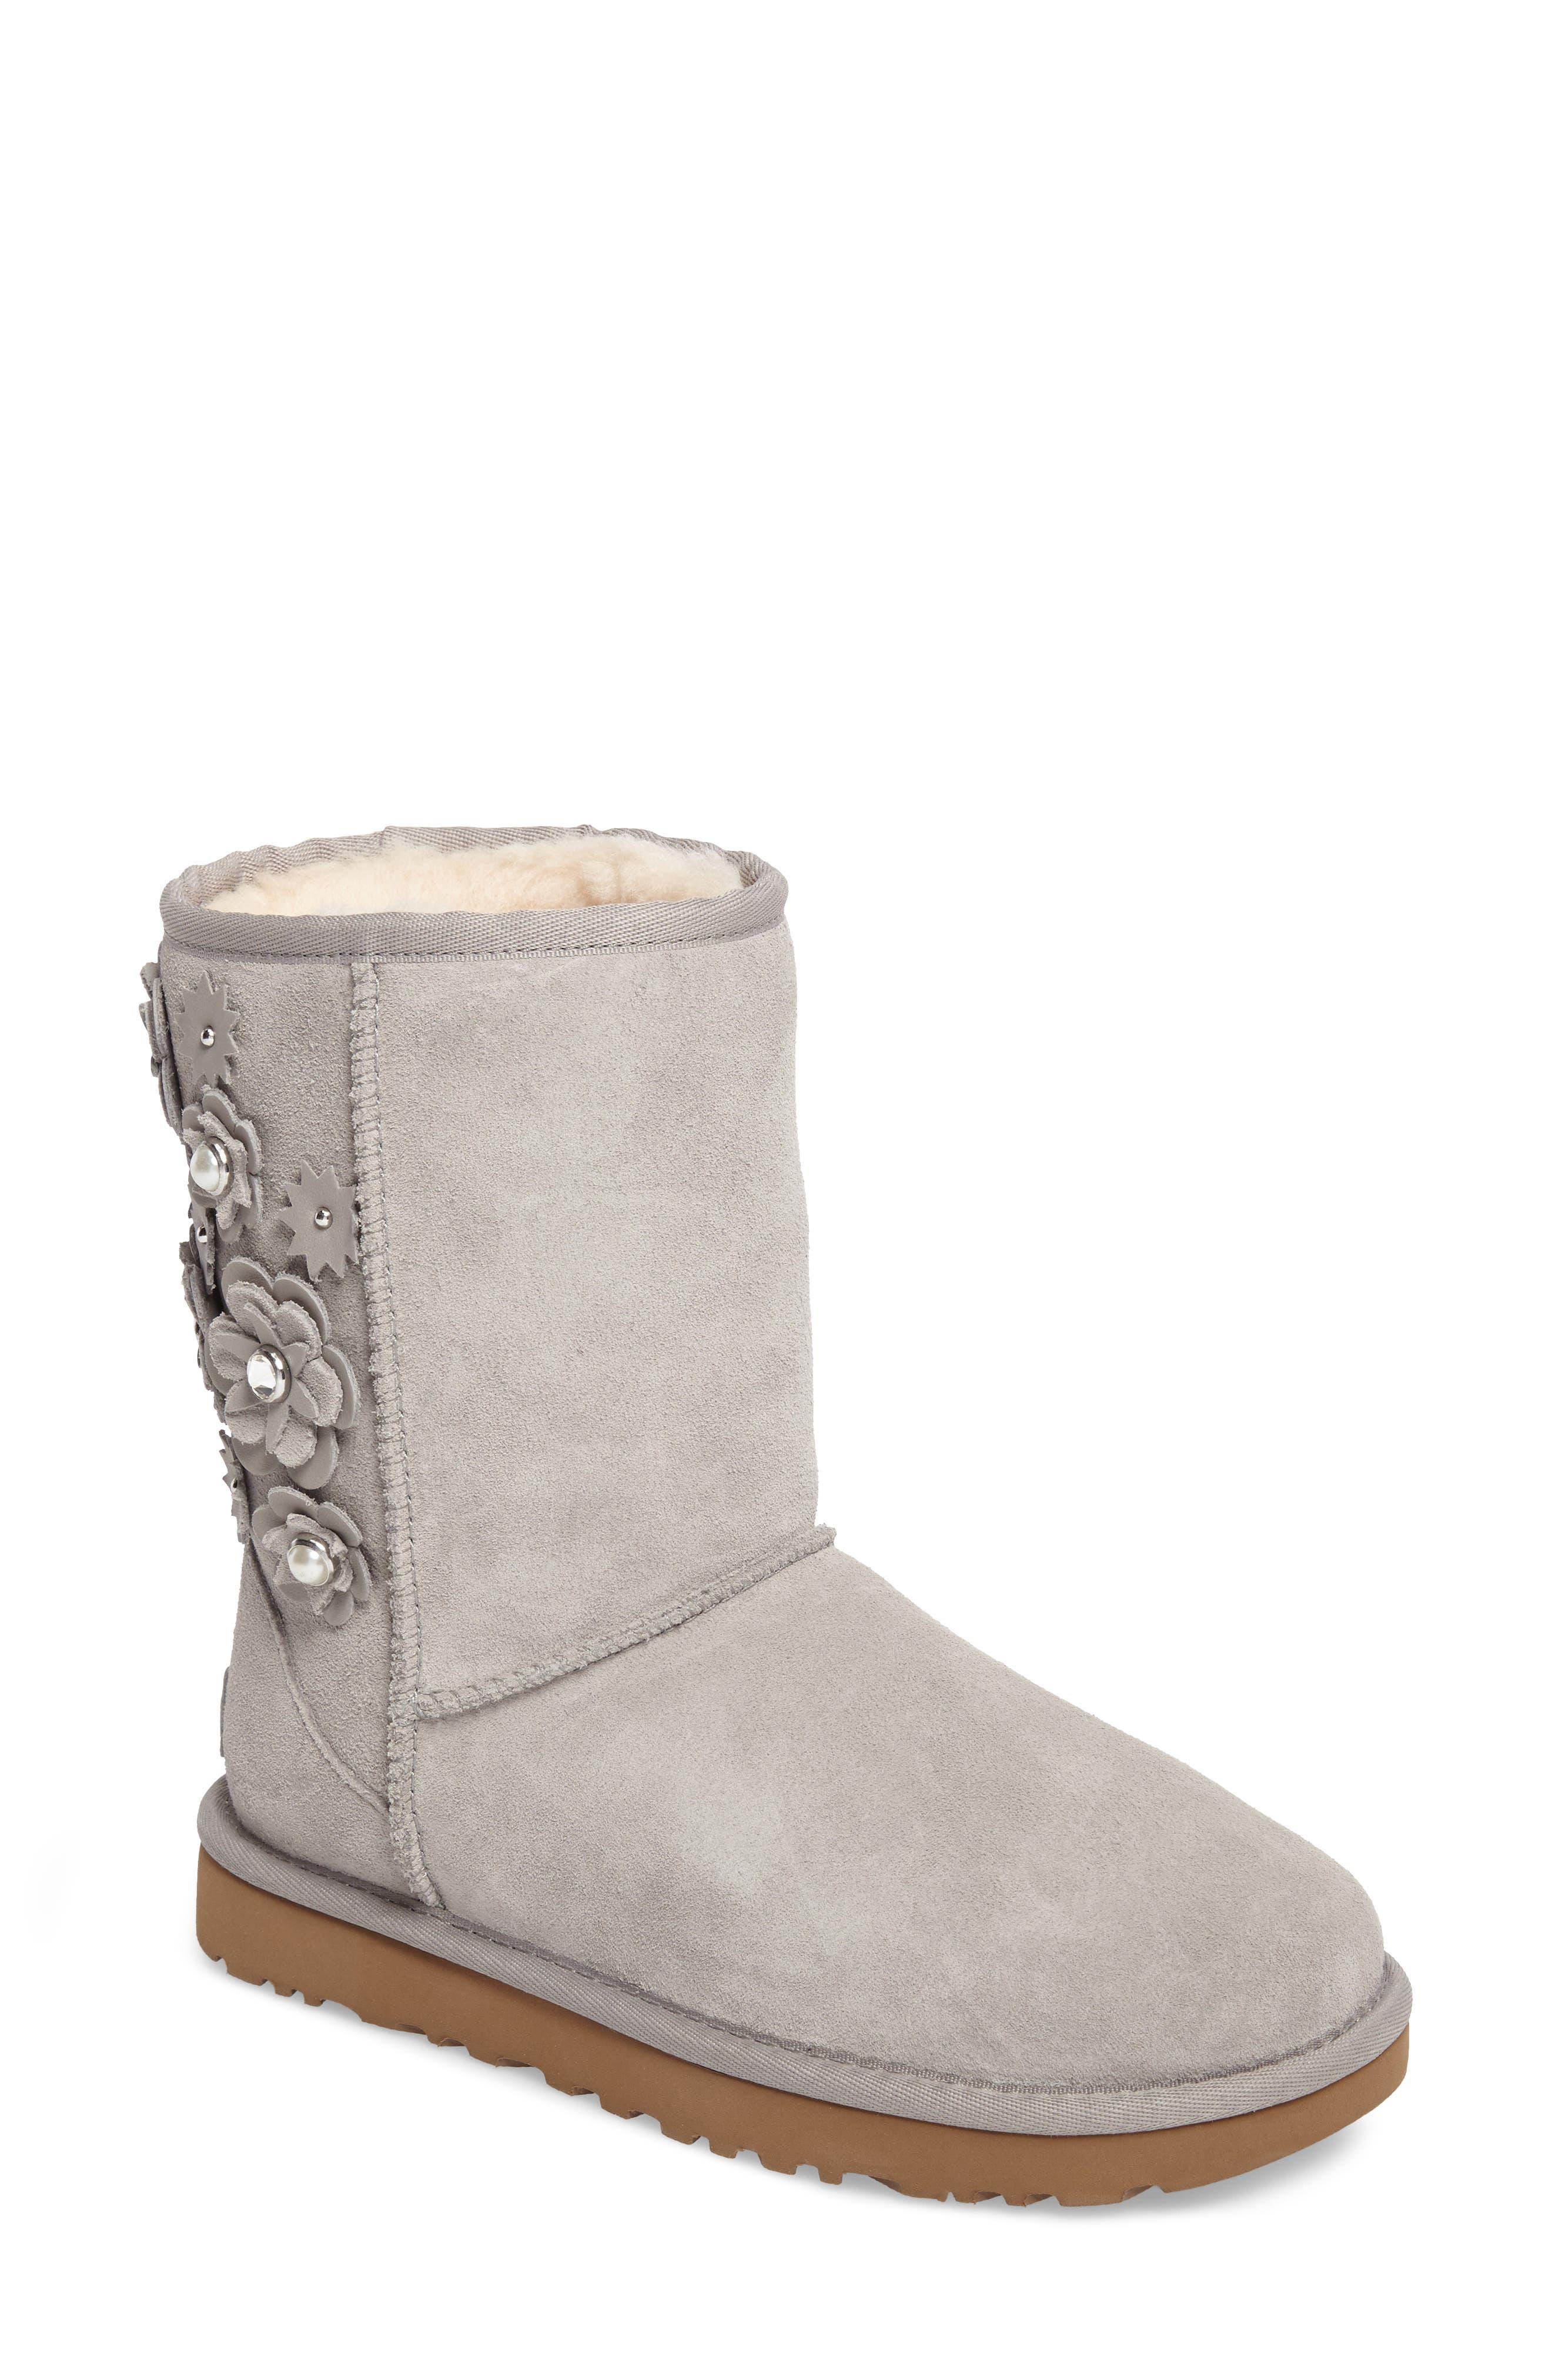 Alternate Image 1 Selected - UGG® Classic Short Petal Boot (Women)